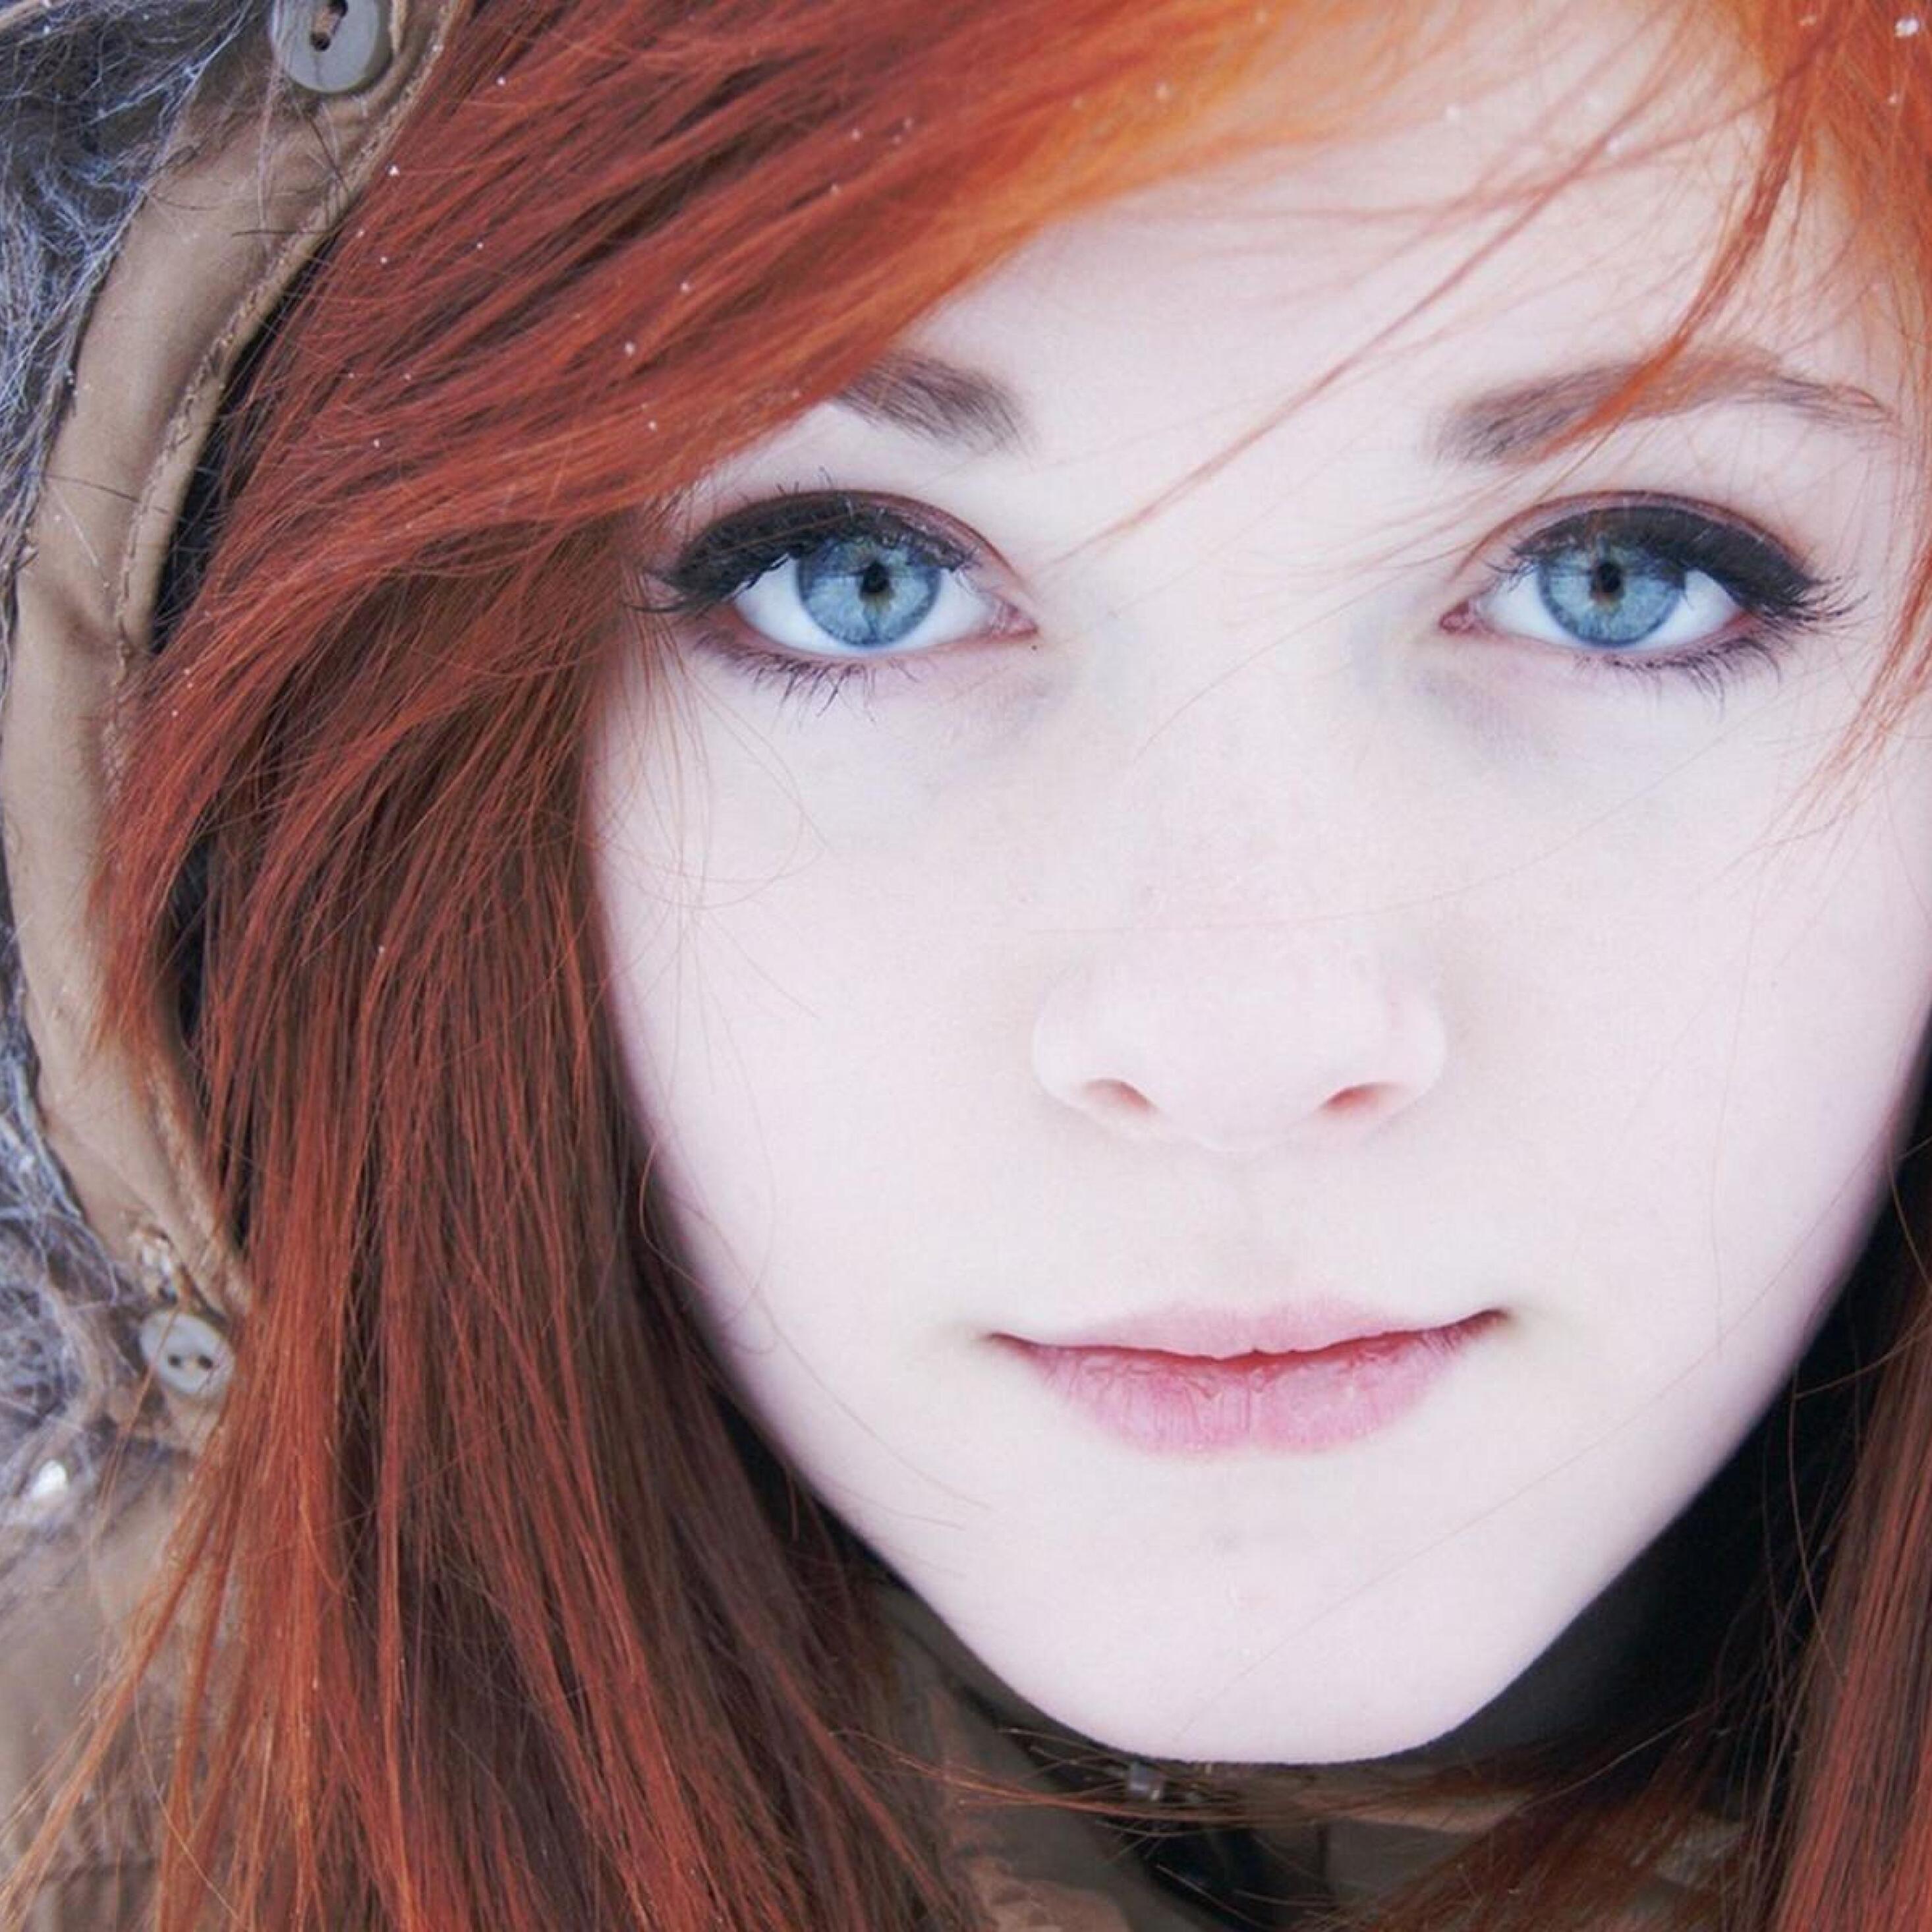 2932x2932 Beautiful Blue Eyes Red Head Girl 4k Ipad Pro